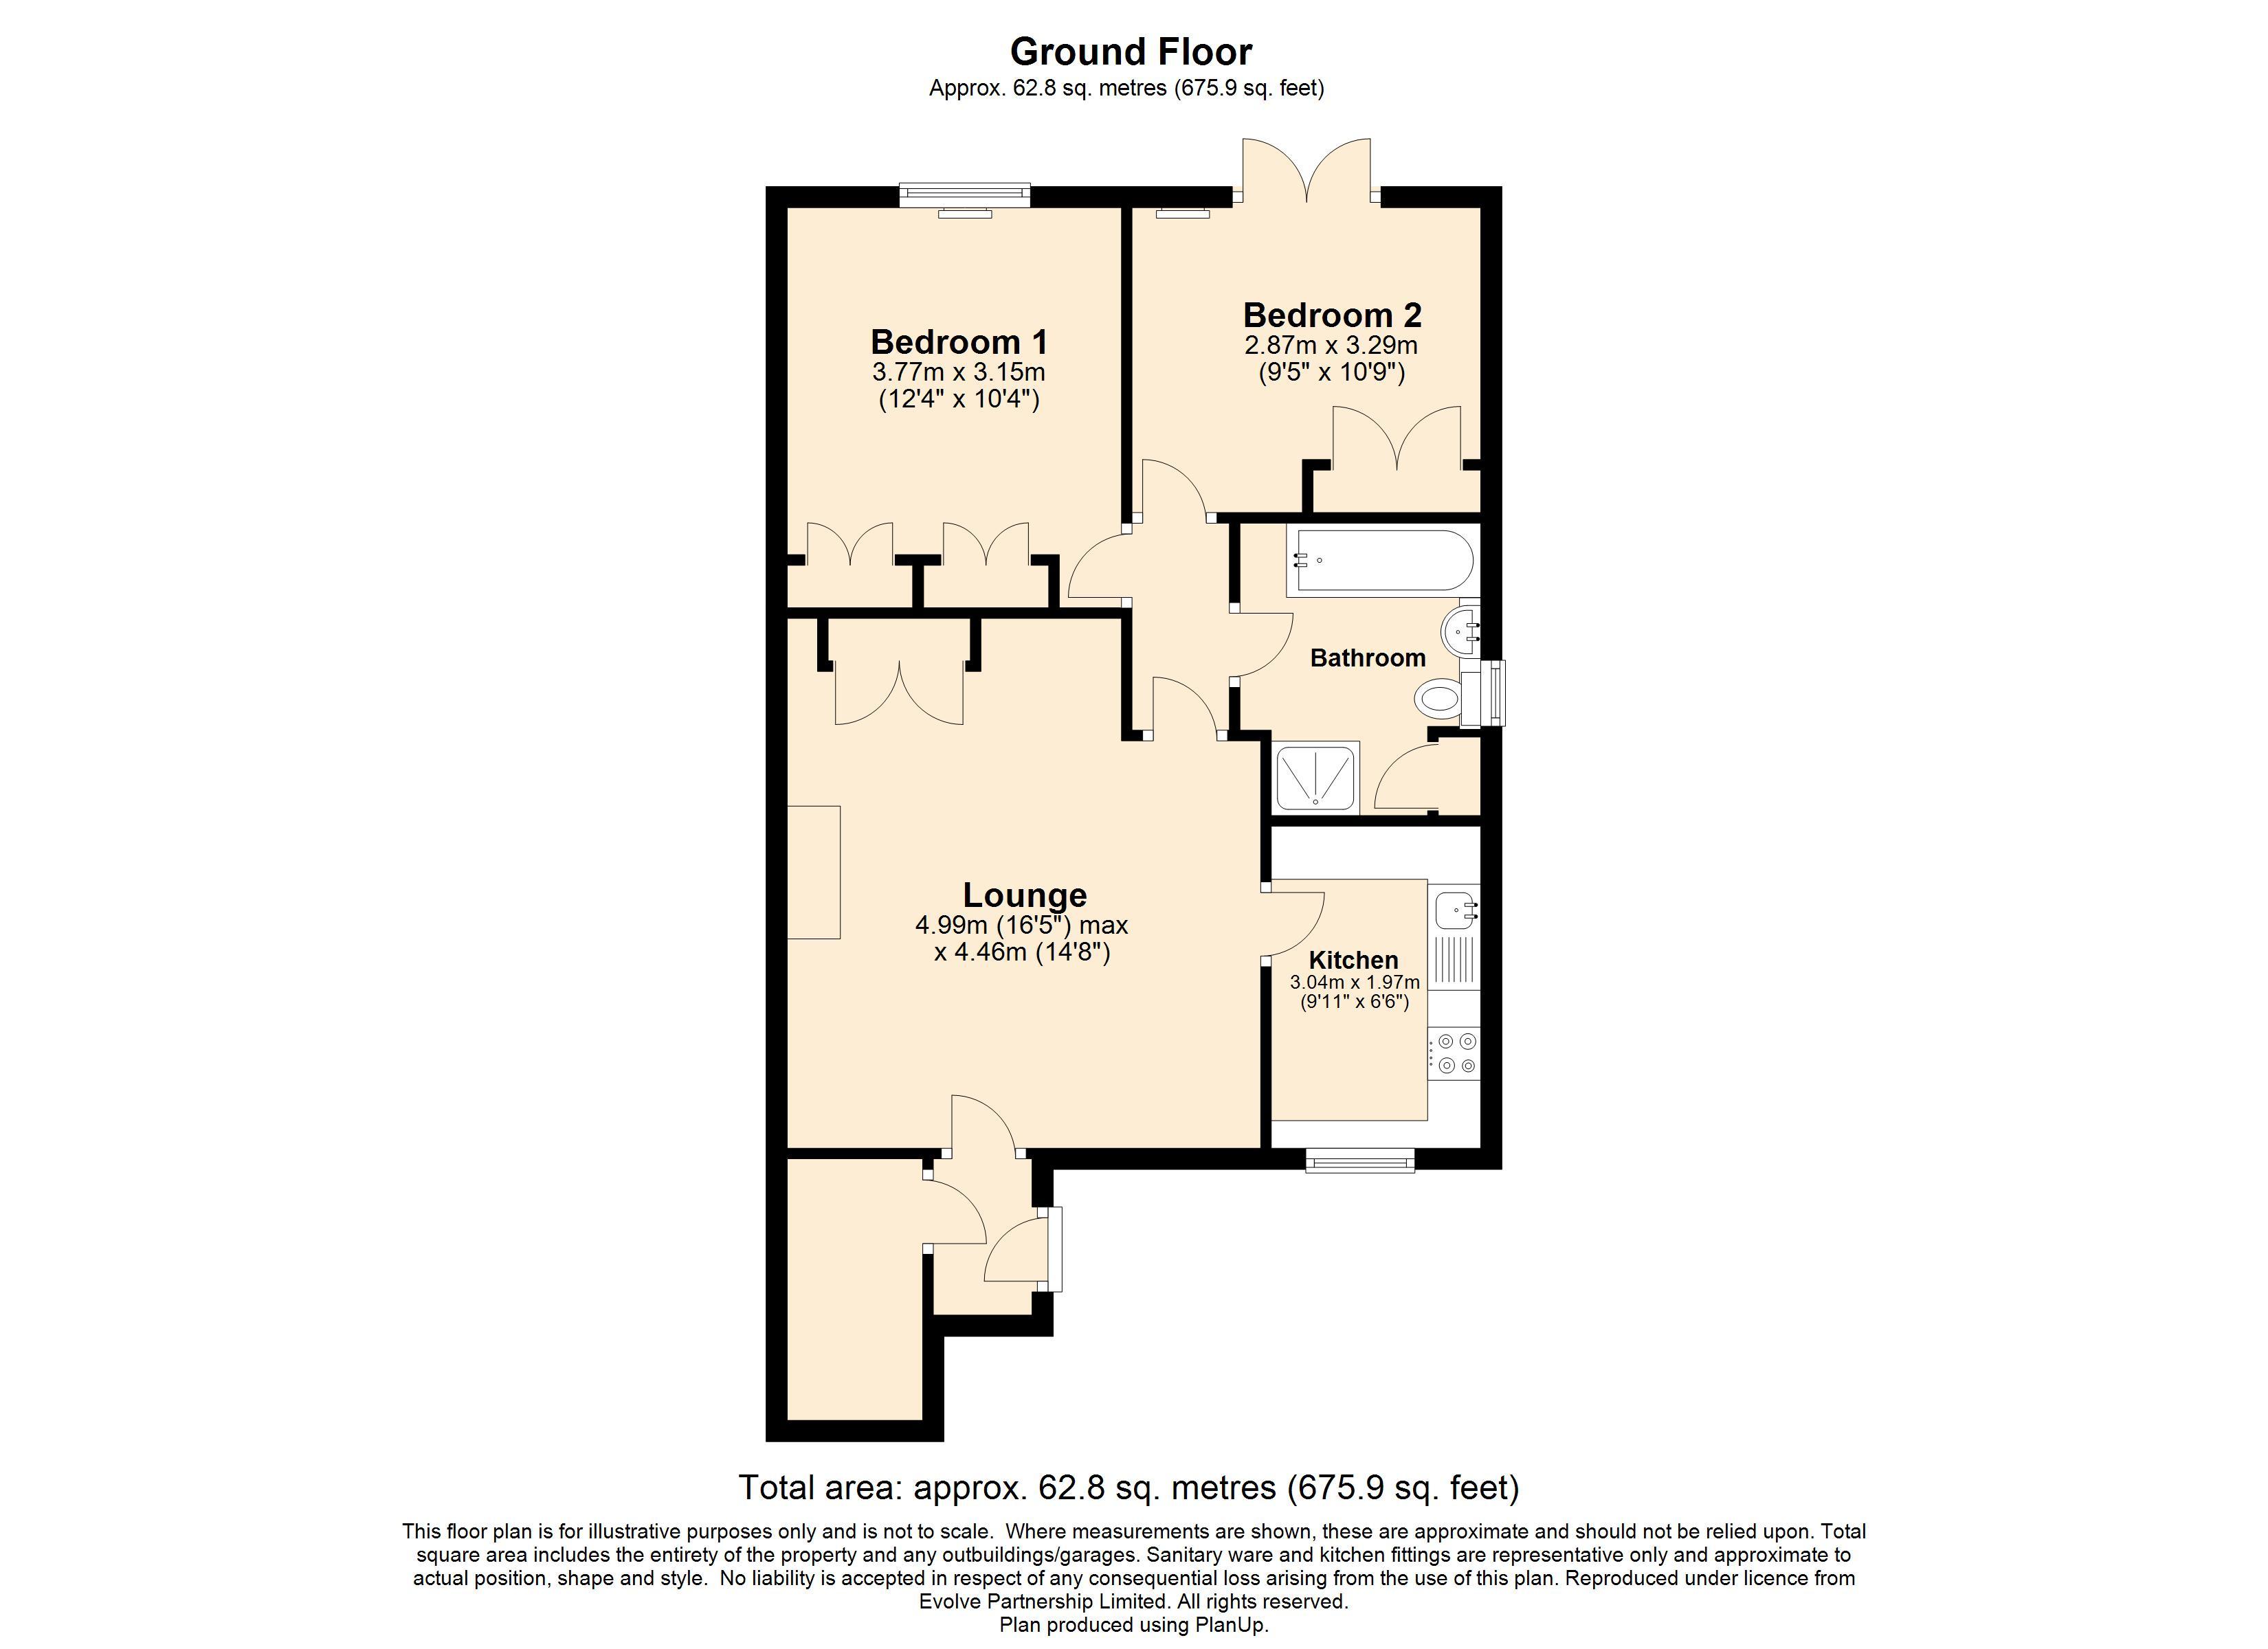 10 Ilford Court Floorplan